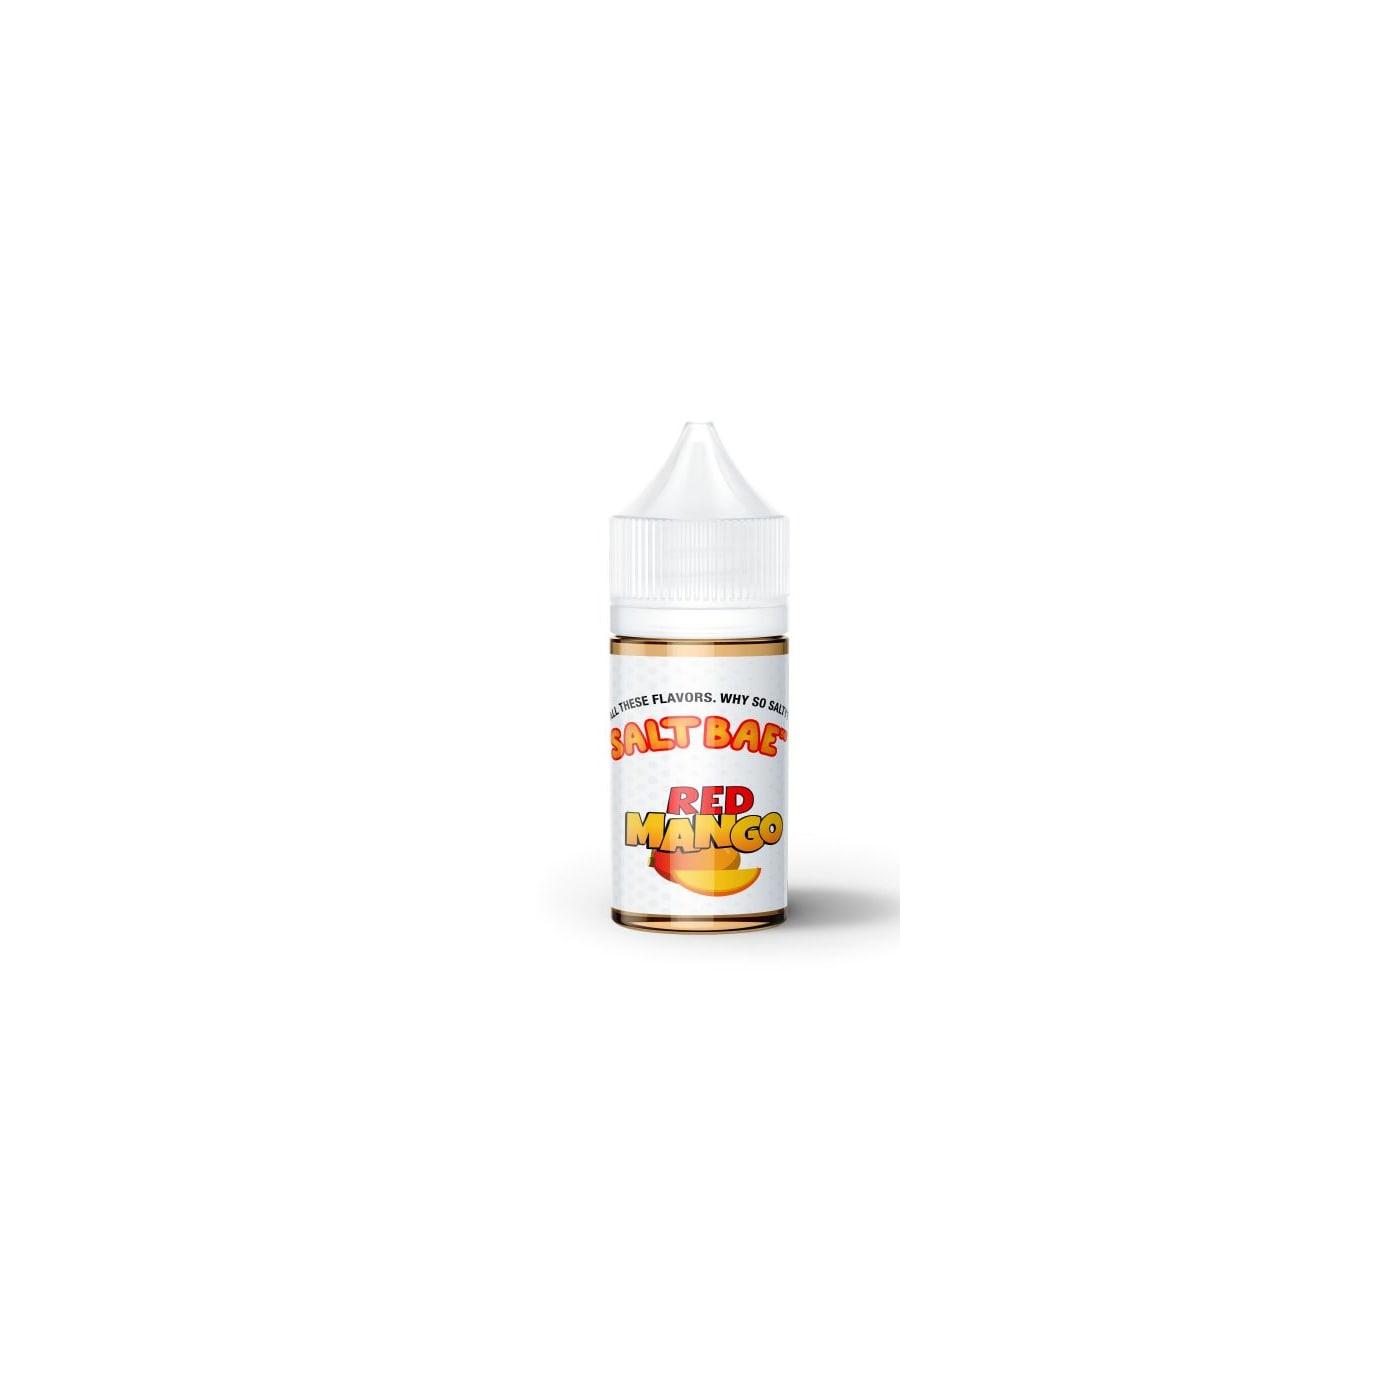 Salt Bae Salts Red Mango